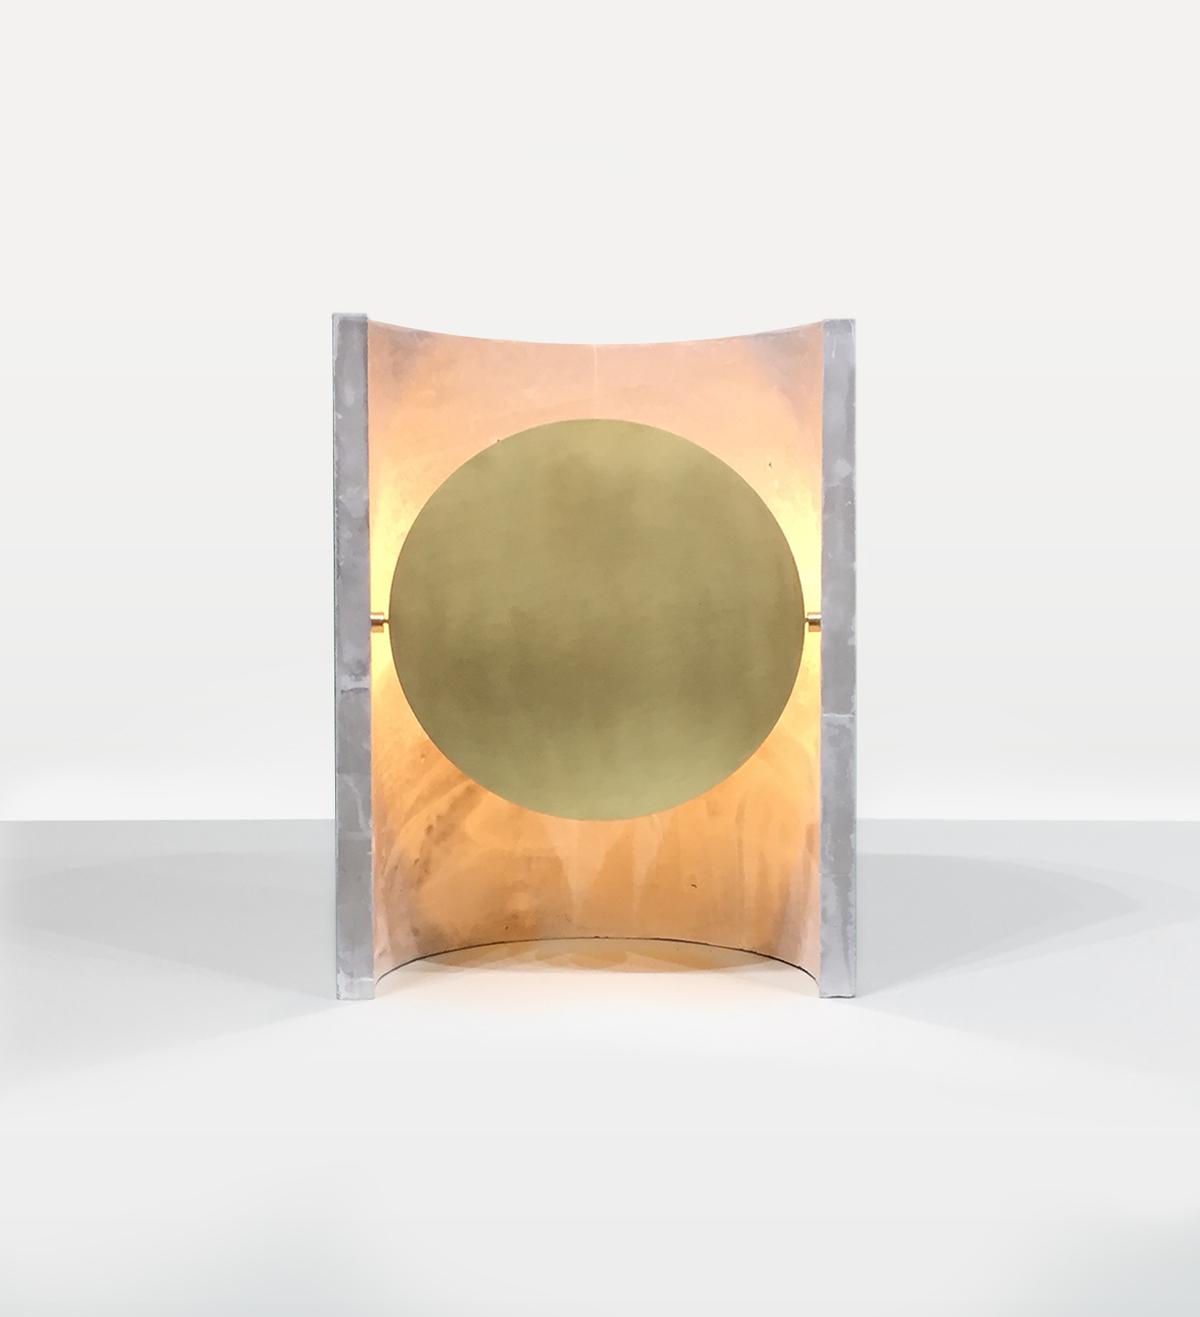 Custom piece designed with Norway based designer Thomas Jenkins - Norway x New York.